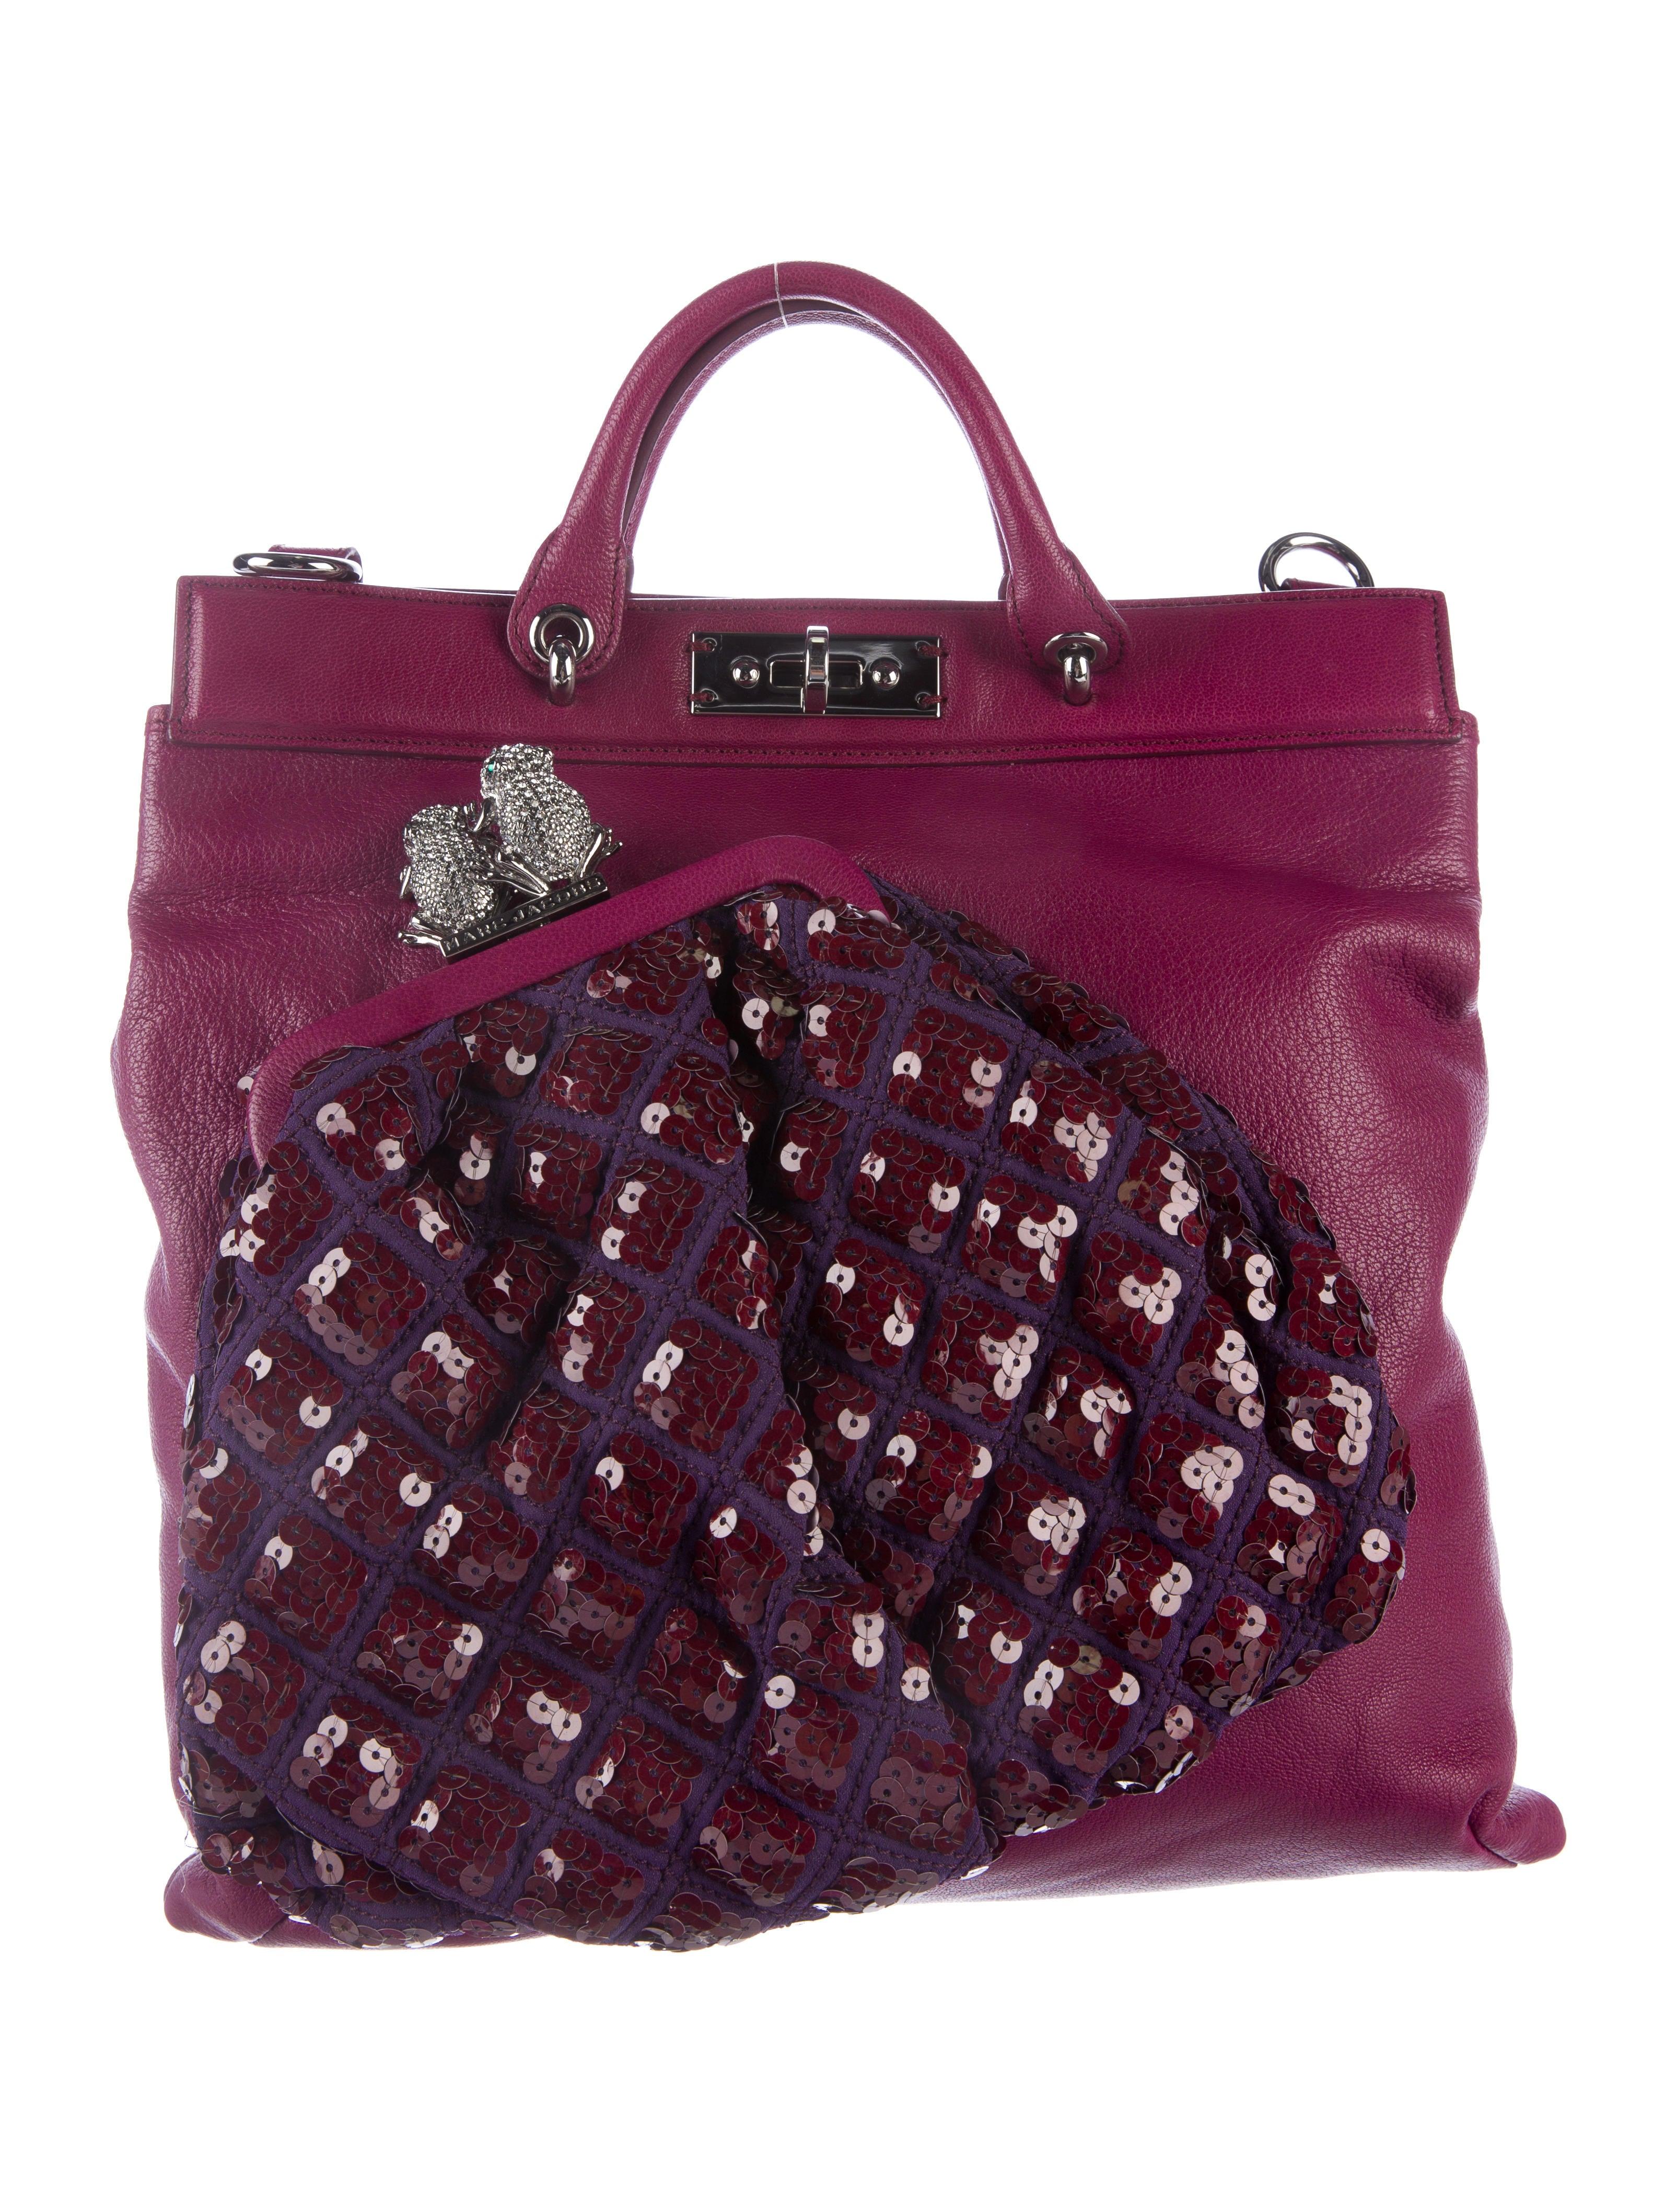 d883c64d1eaa Marc Jacobs Leather Robert Duffy Tote - Handbags - MAR44698